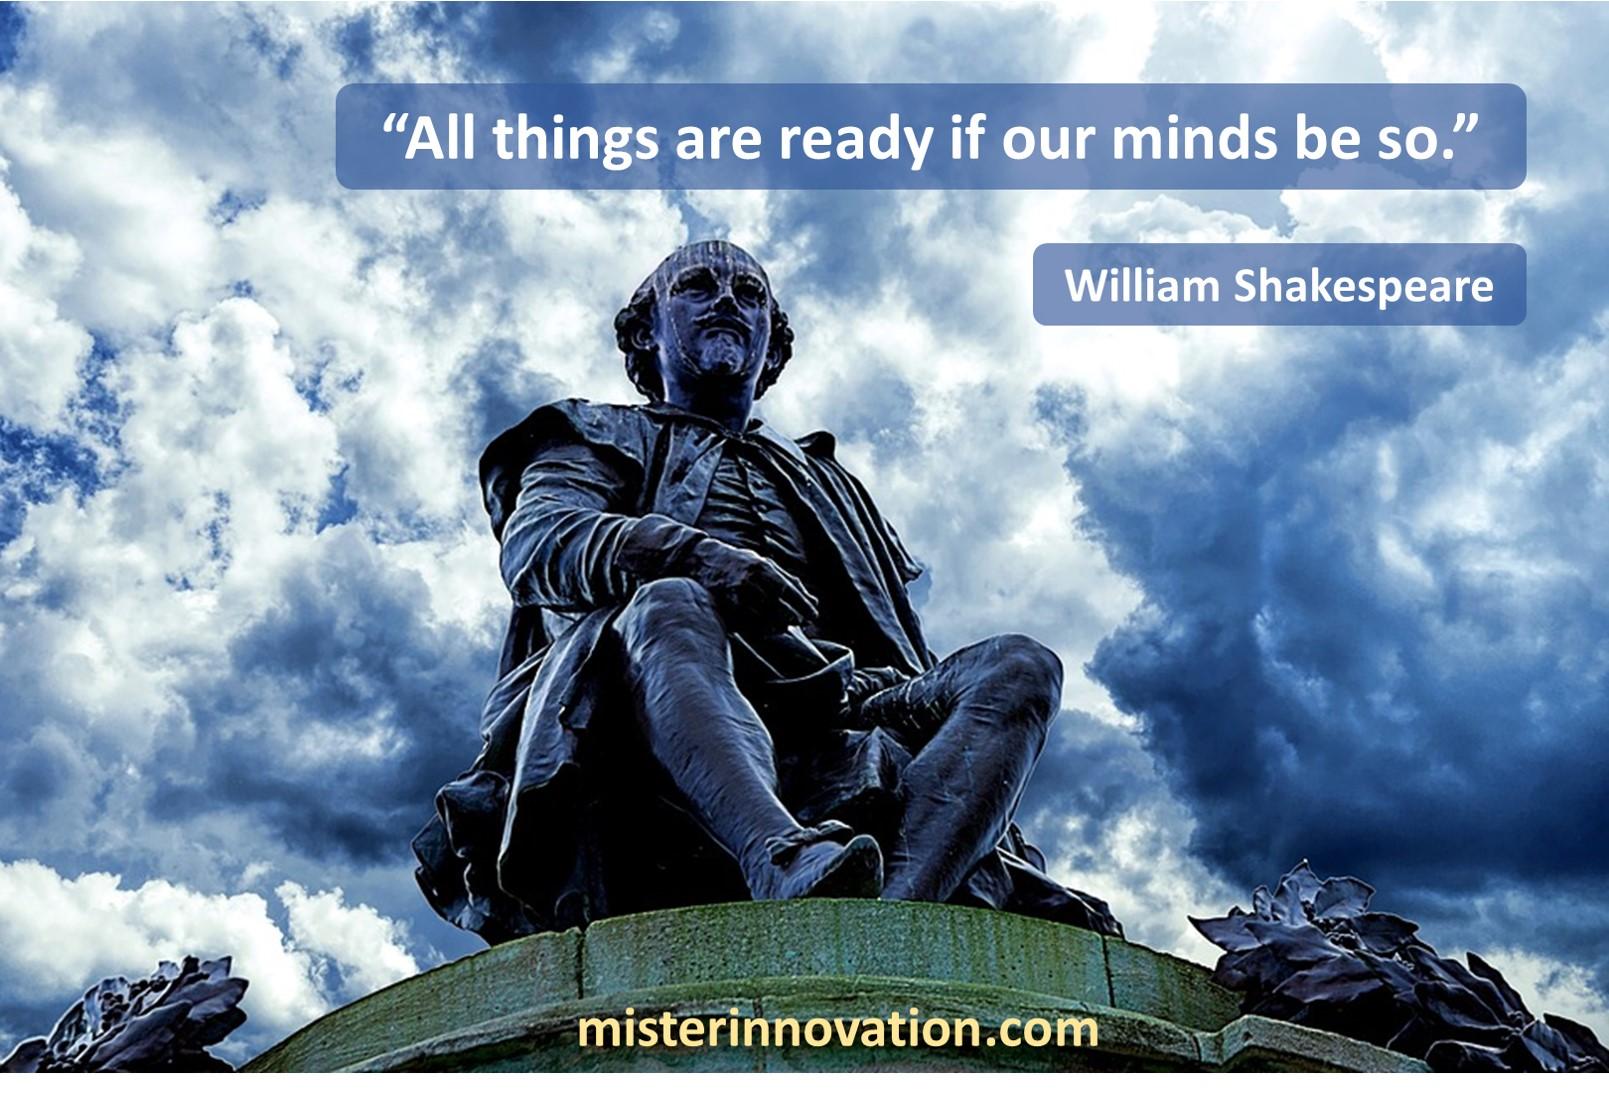 William Shakespeare Minds